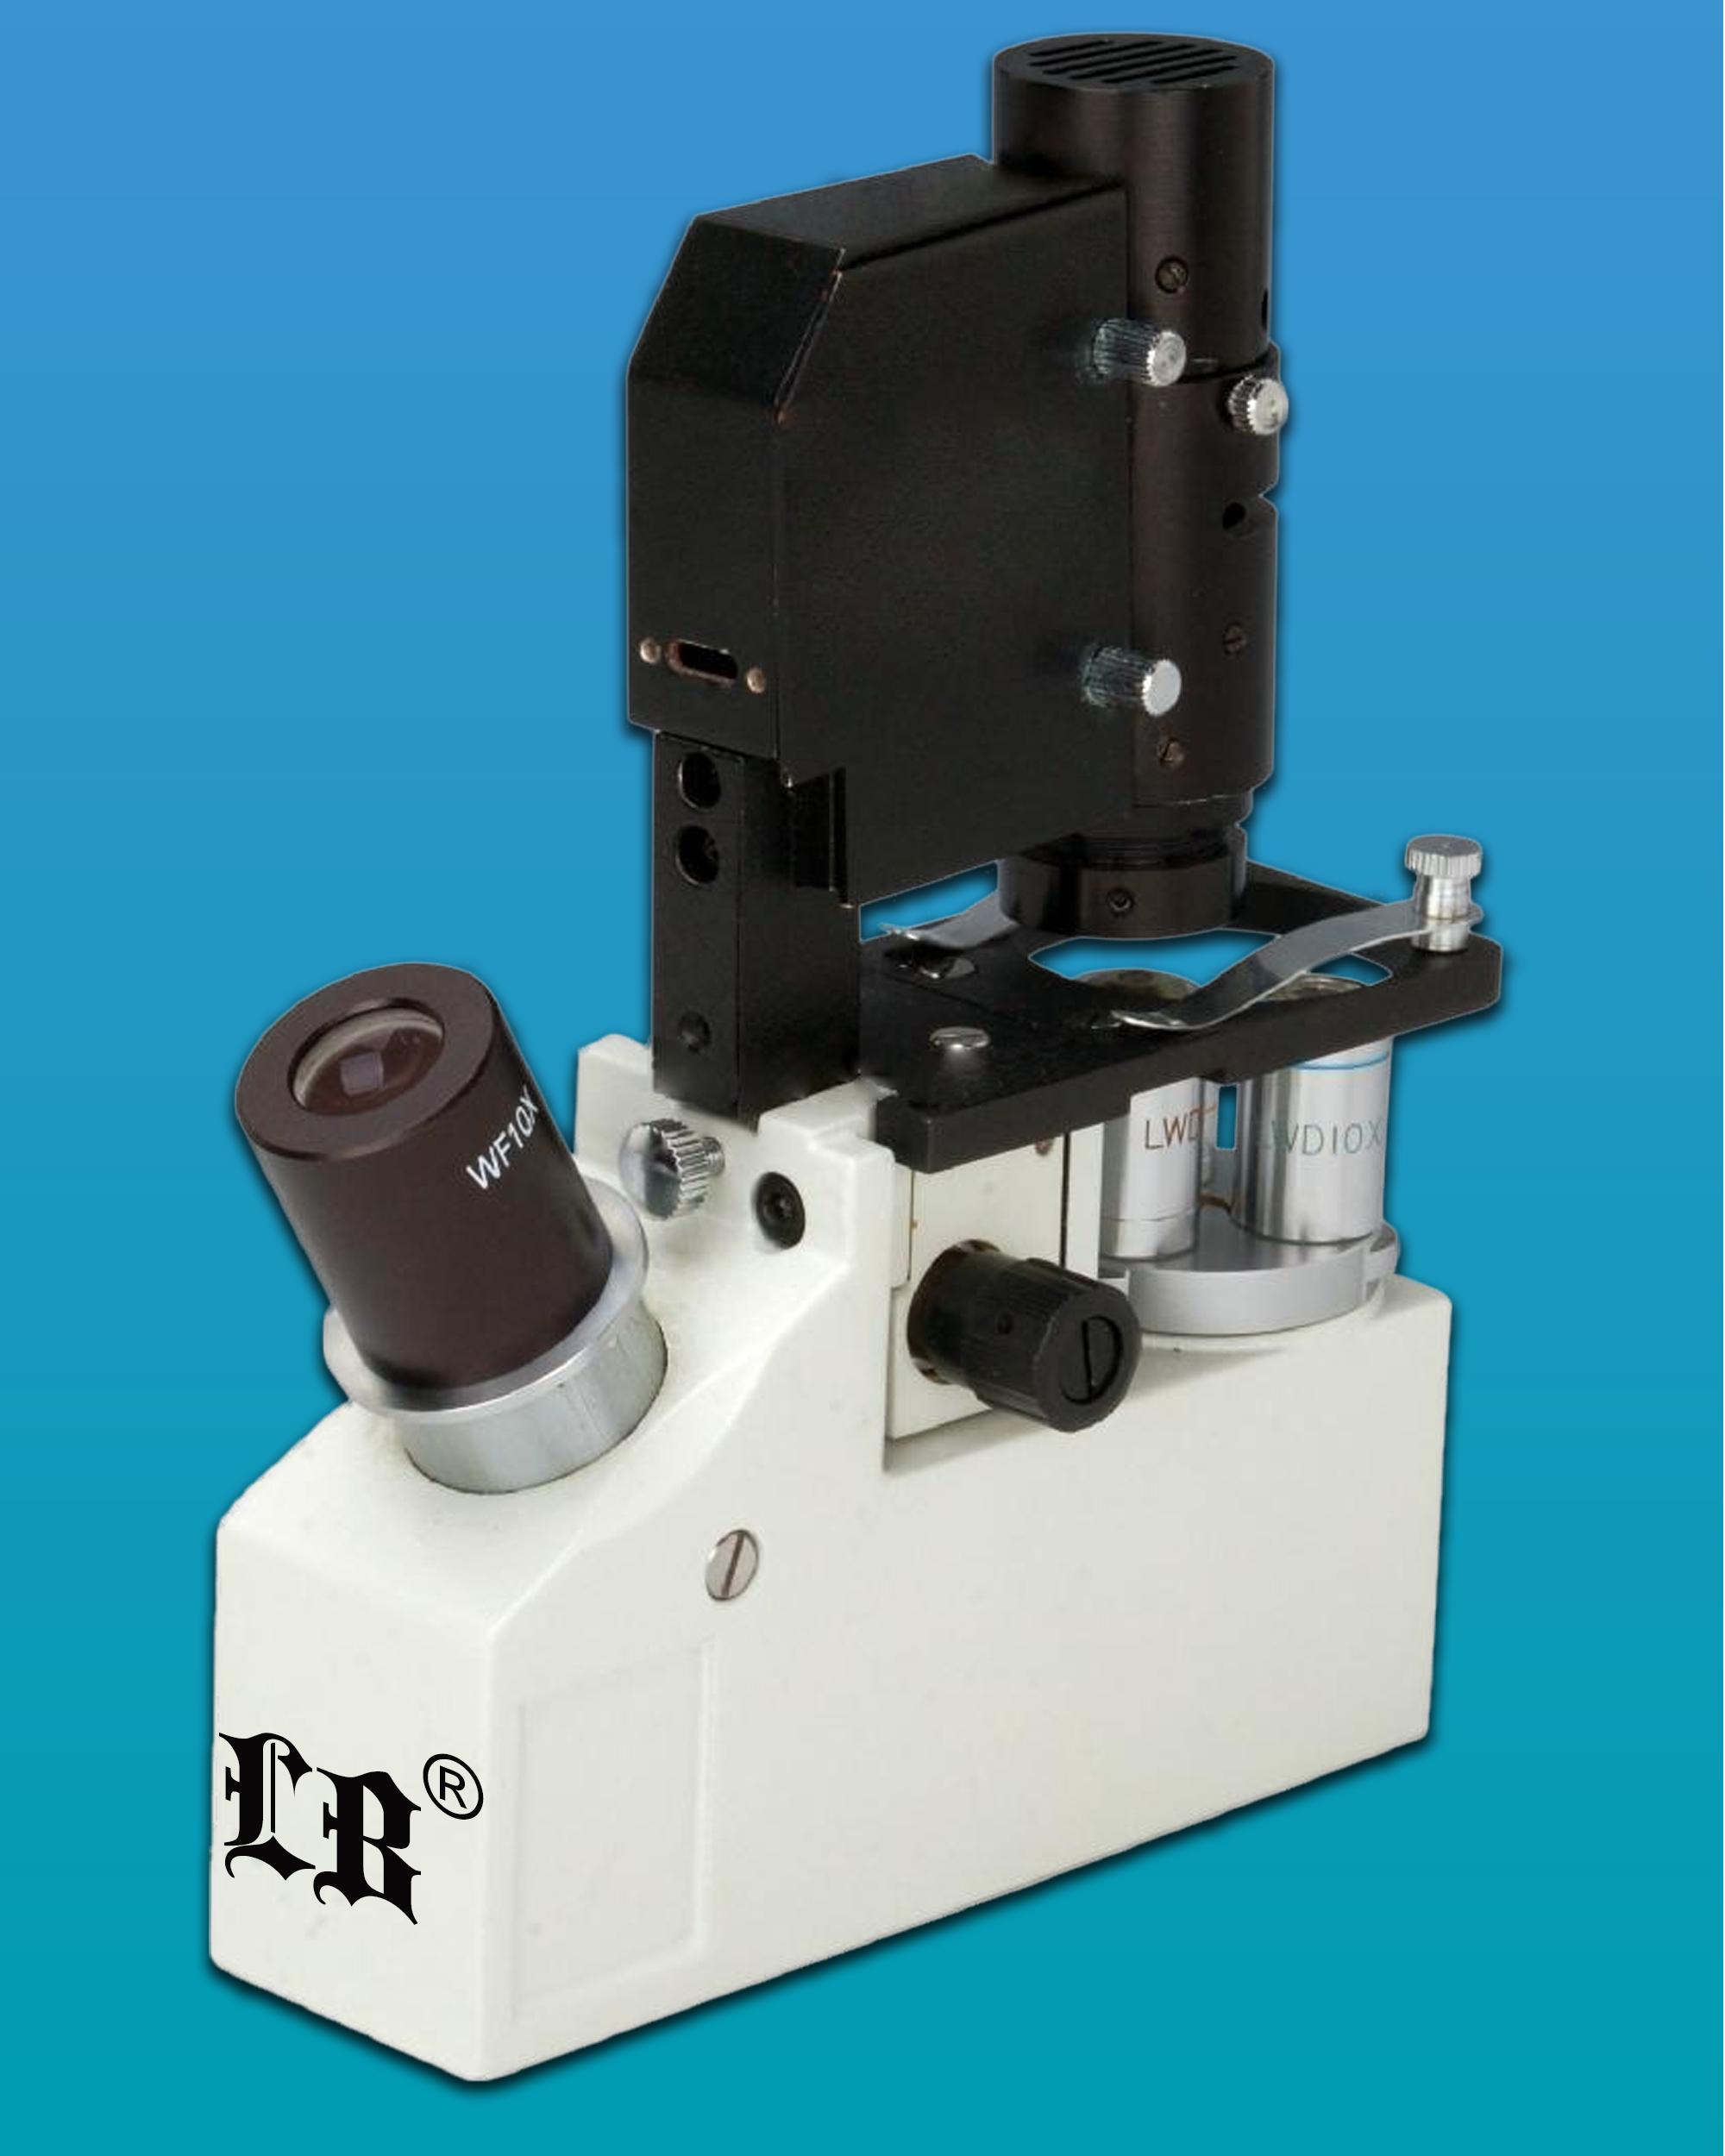 [LB-122] Portable Monocular Inverted Biological Microscope